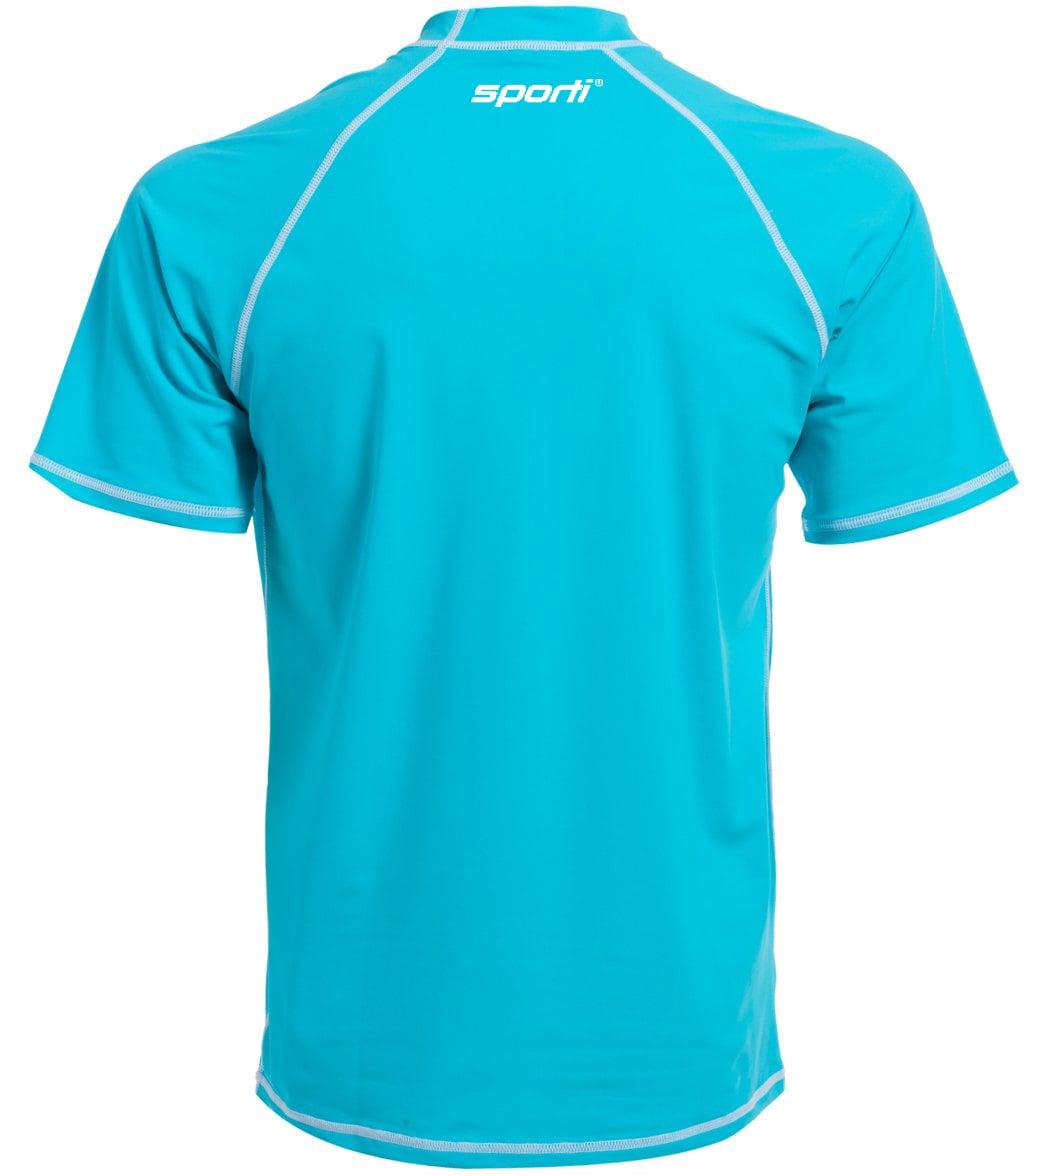 Sporti Men s S S UPF 50+ Swim Shirt at SwimOutlet.com aac999242